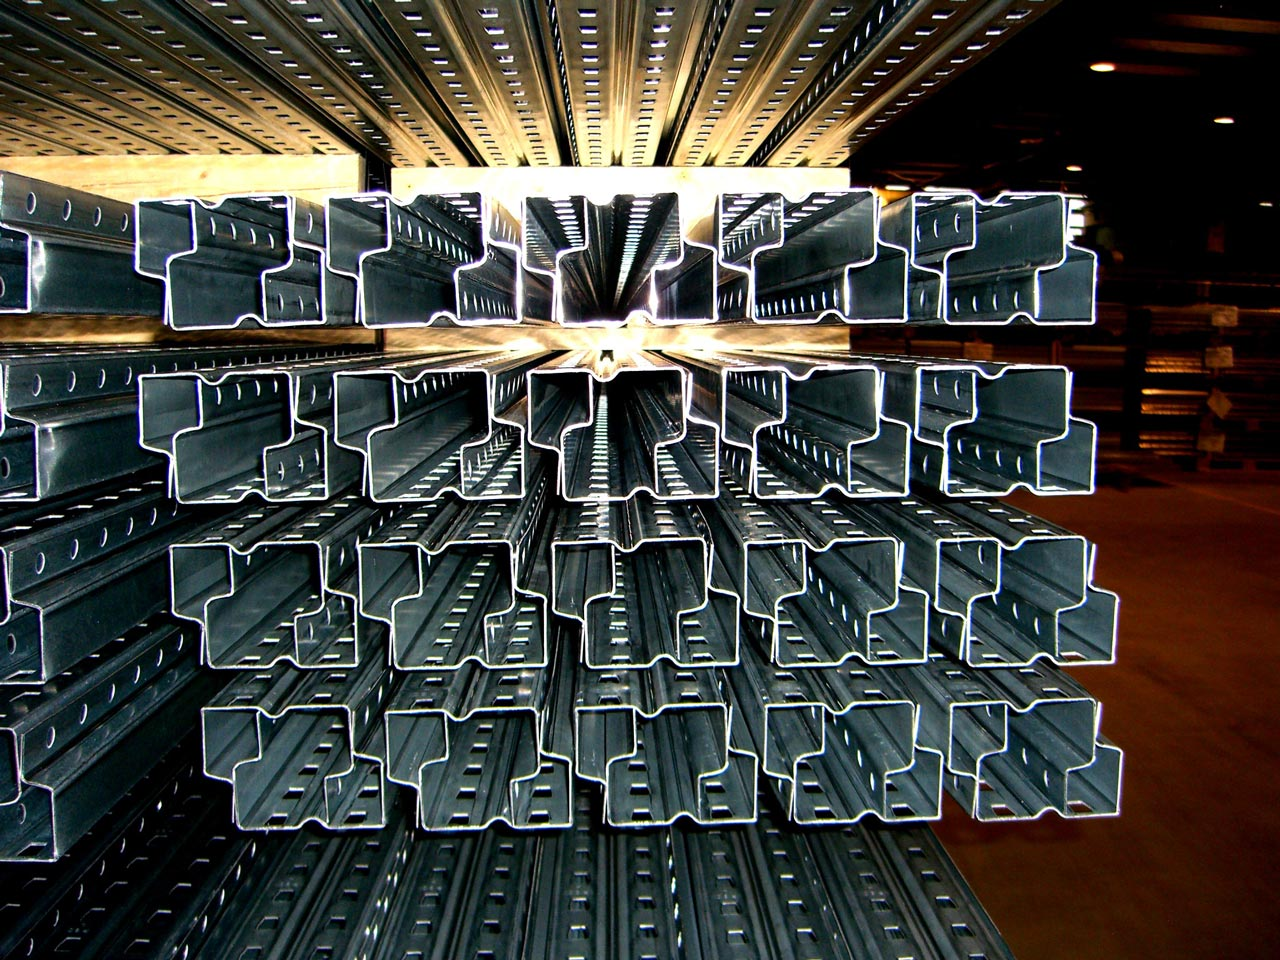 Regalpfosten, Regalstützen, Regalboden, Stützen, Pfosten, Profile für Regale, Lagerprofile, Bodenblech, Biegeprofil, Stanzprofil, Regalelemente